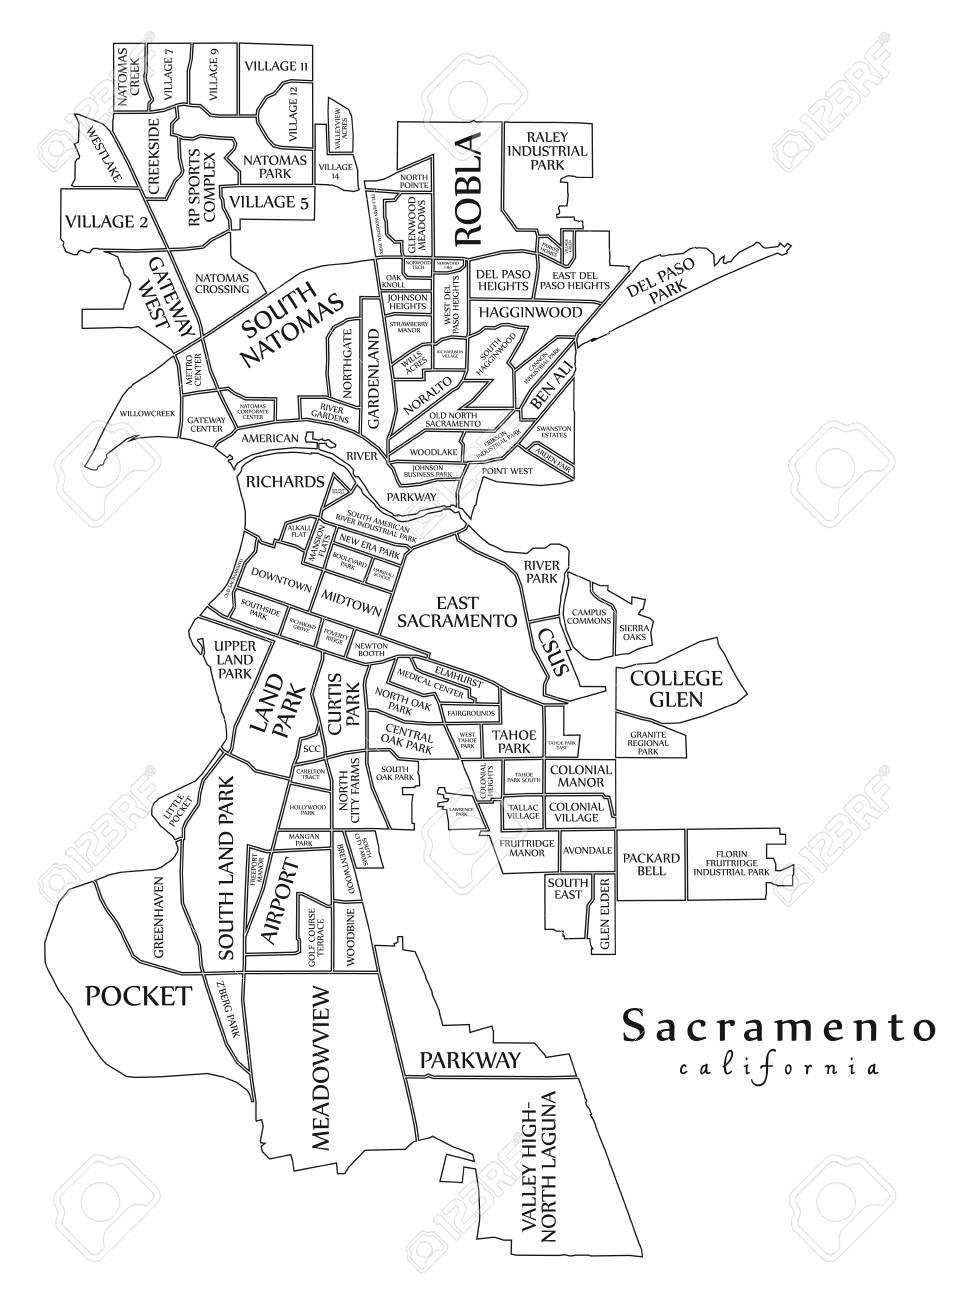 Modern City Map Sacramento California City Of The Usa With